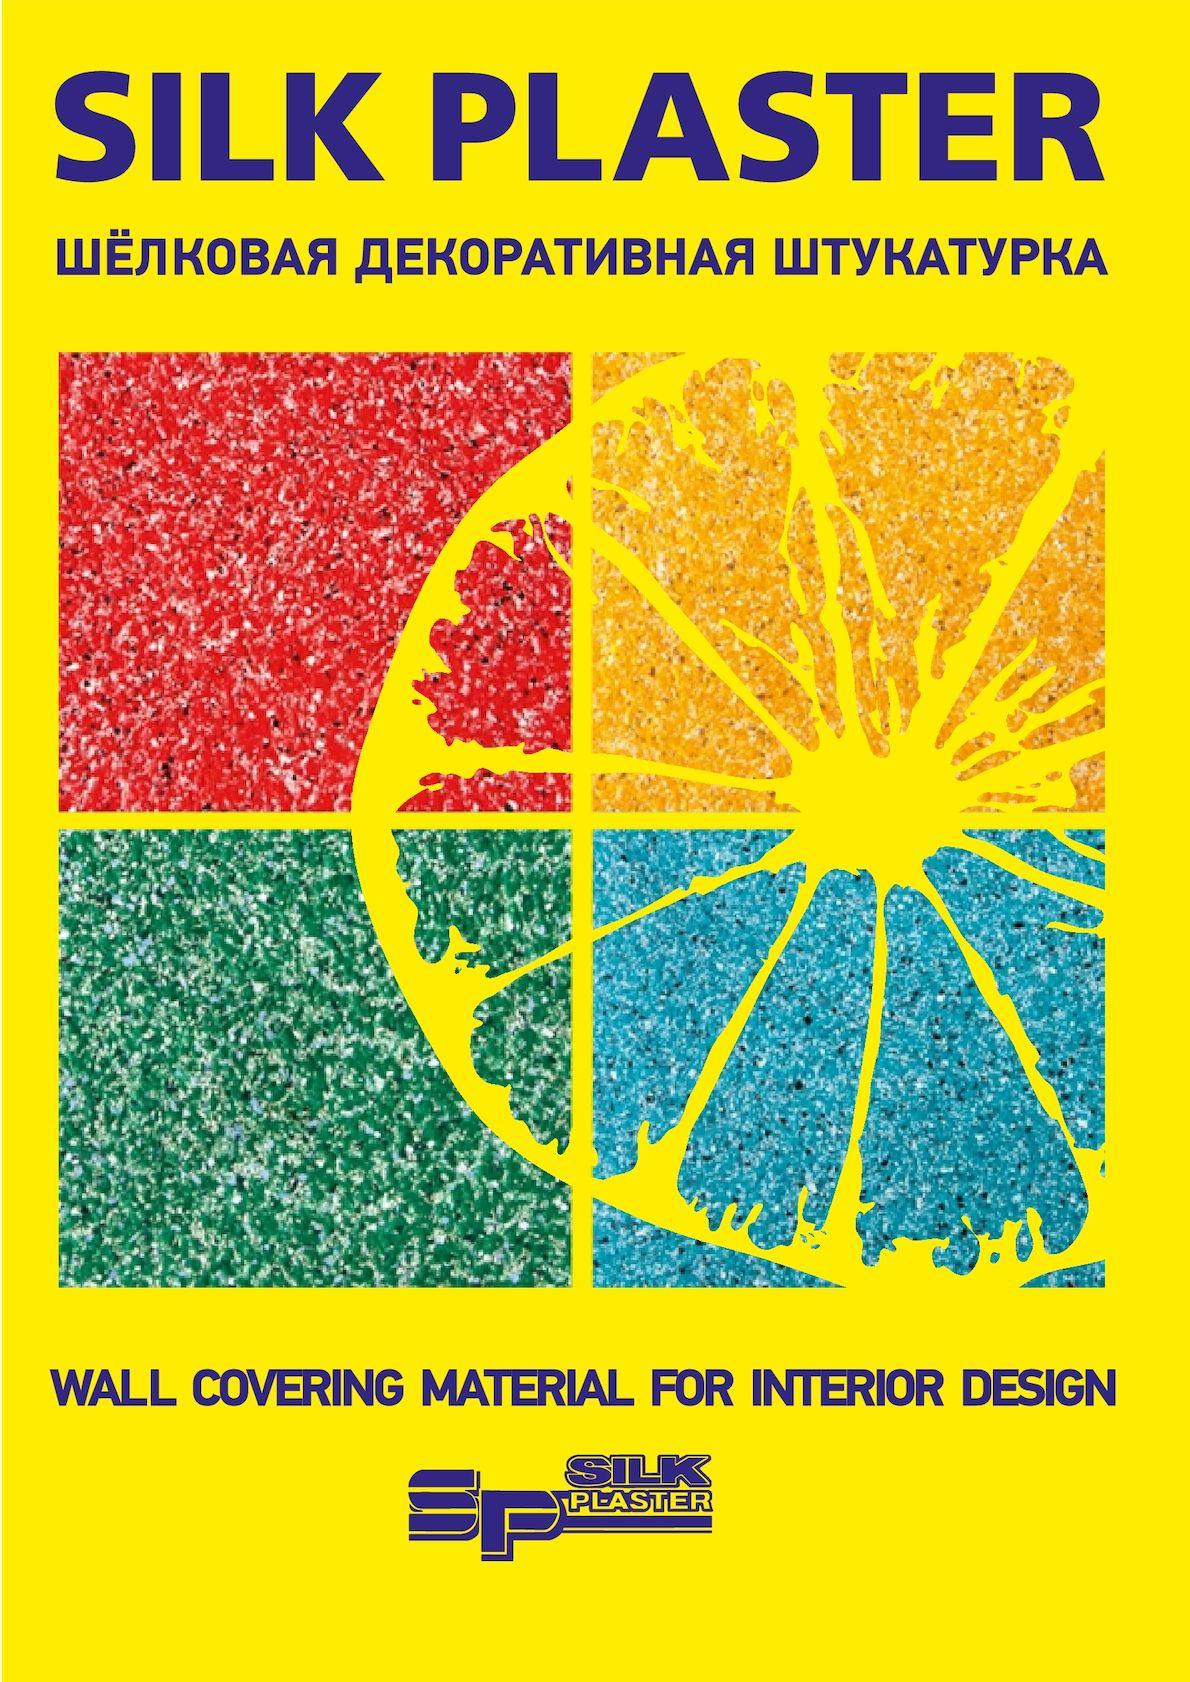 Картинки по запросу silk plaster logo